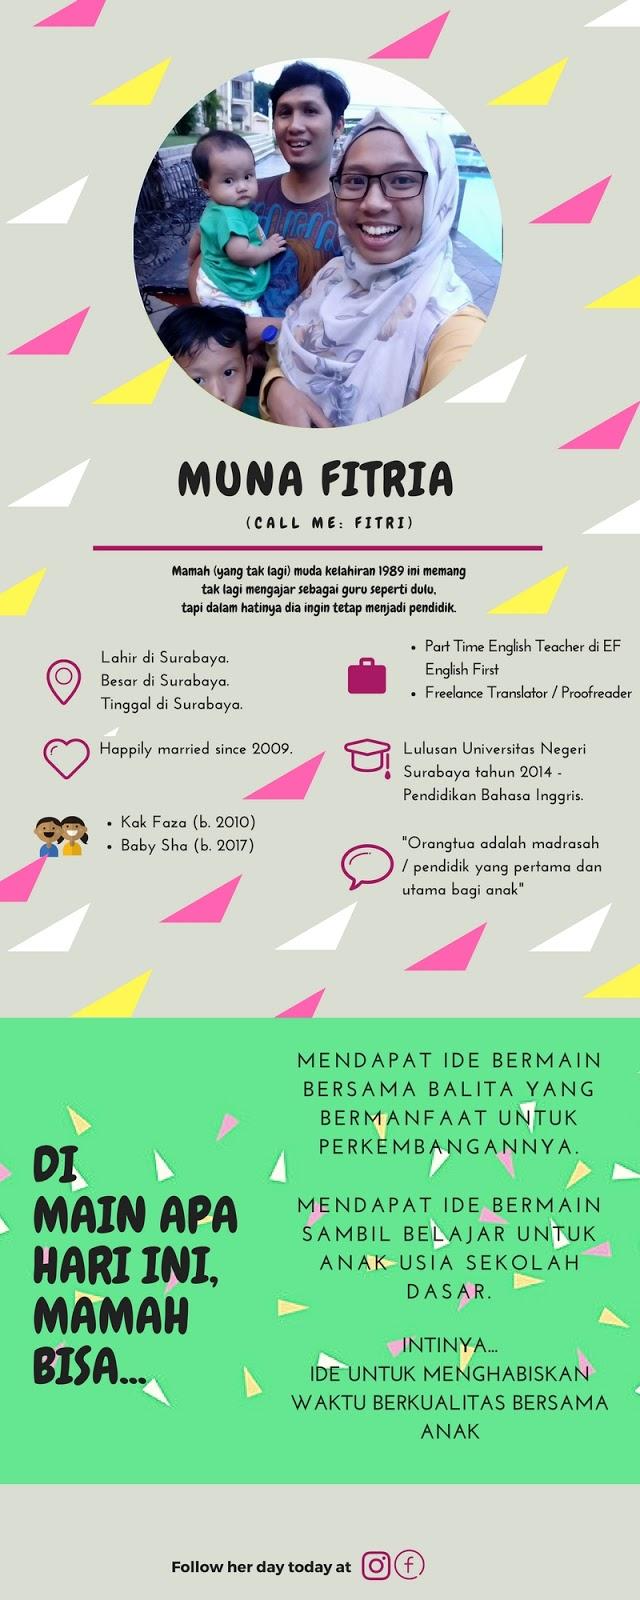 infographic about main apa hari ini?